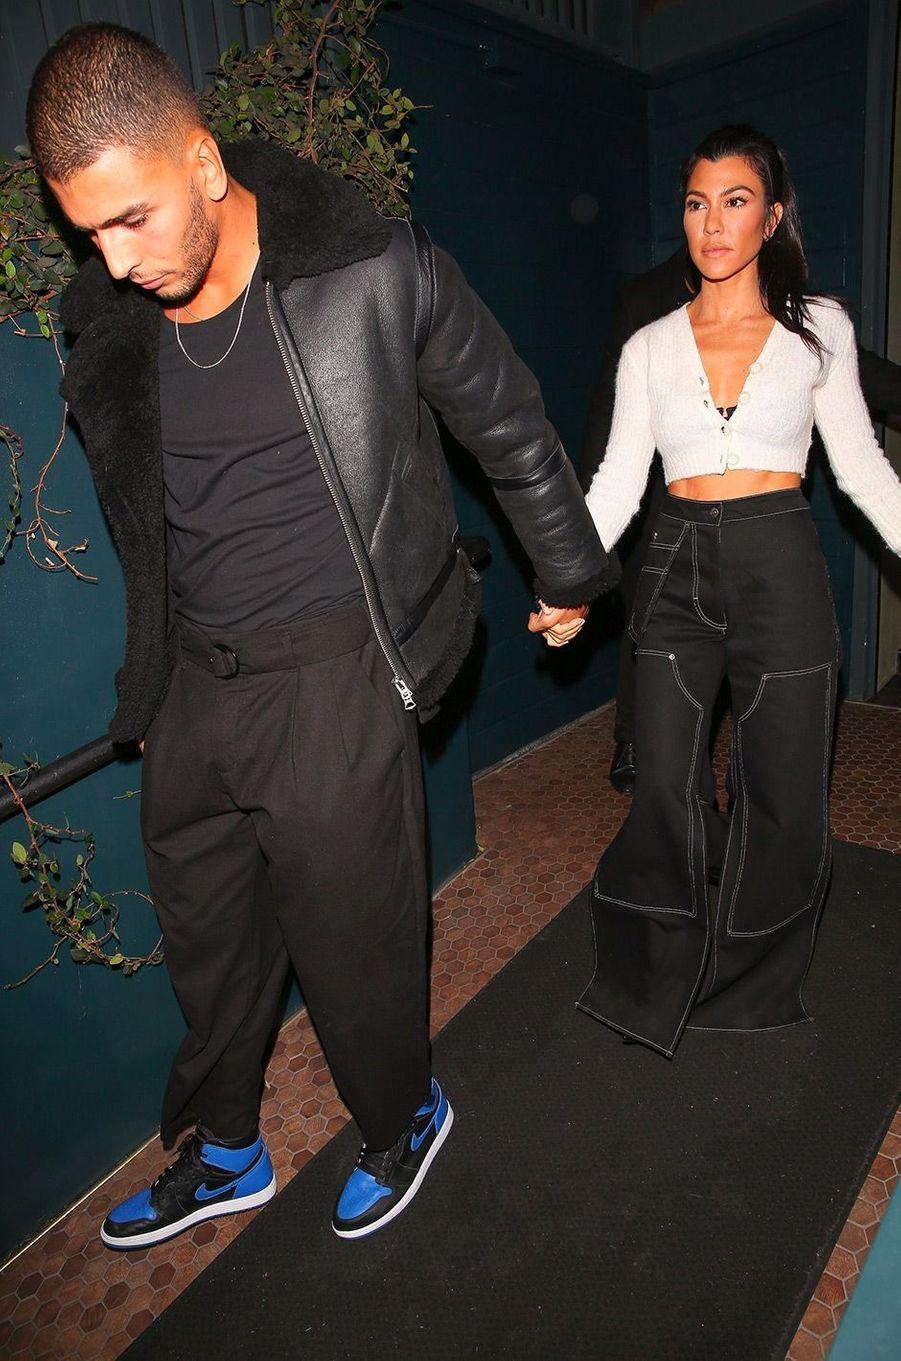 Kourtney Kardashian et Younes Bendjima arrivent à l'anniversaire de Kendall Jenner